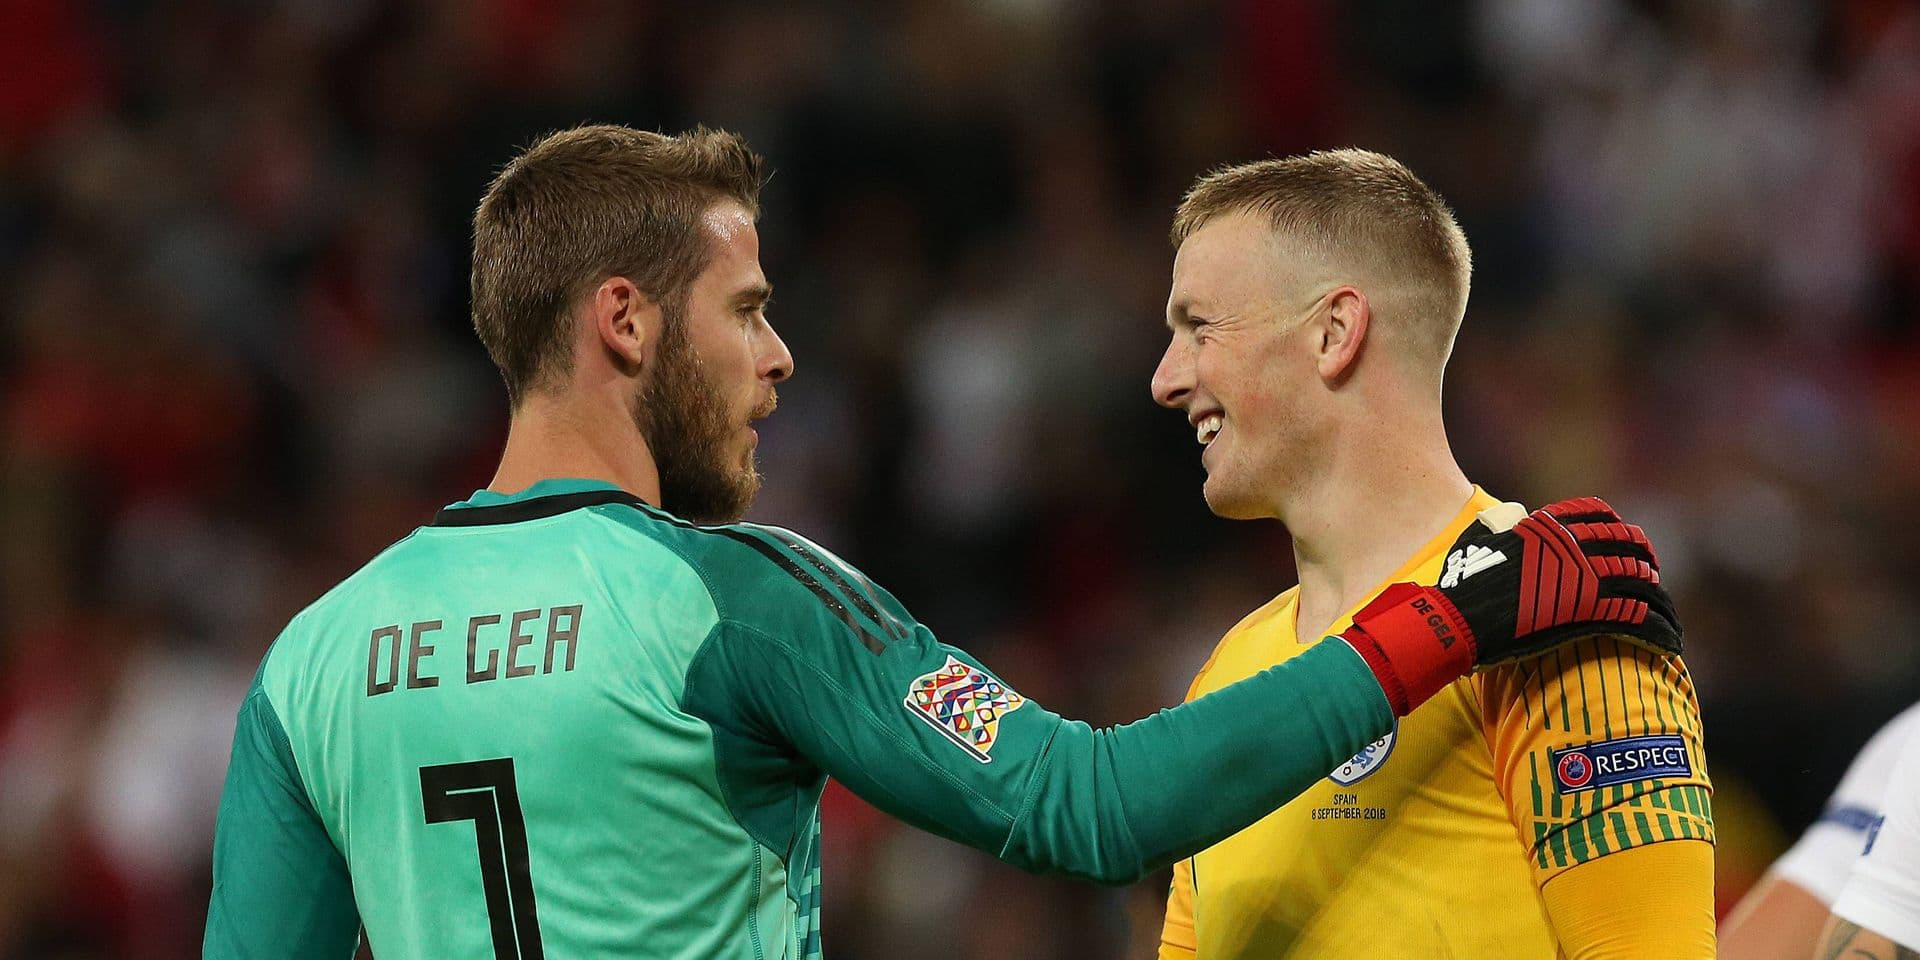 England v Spain UEFA Nations League Jordan Pickford of England and David De Gea of Spain at the end